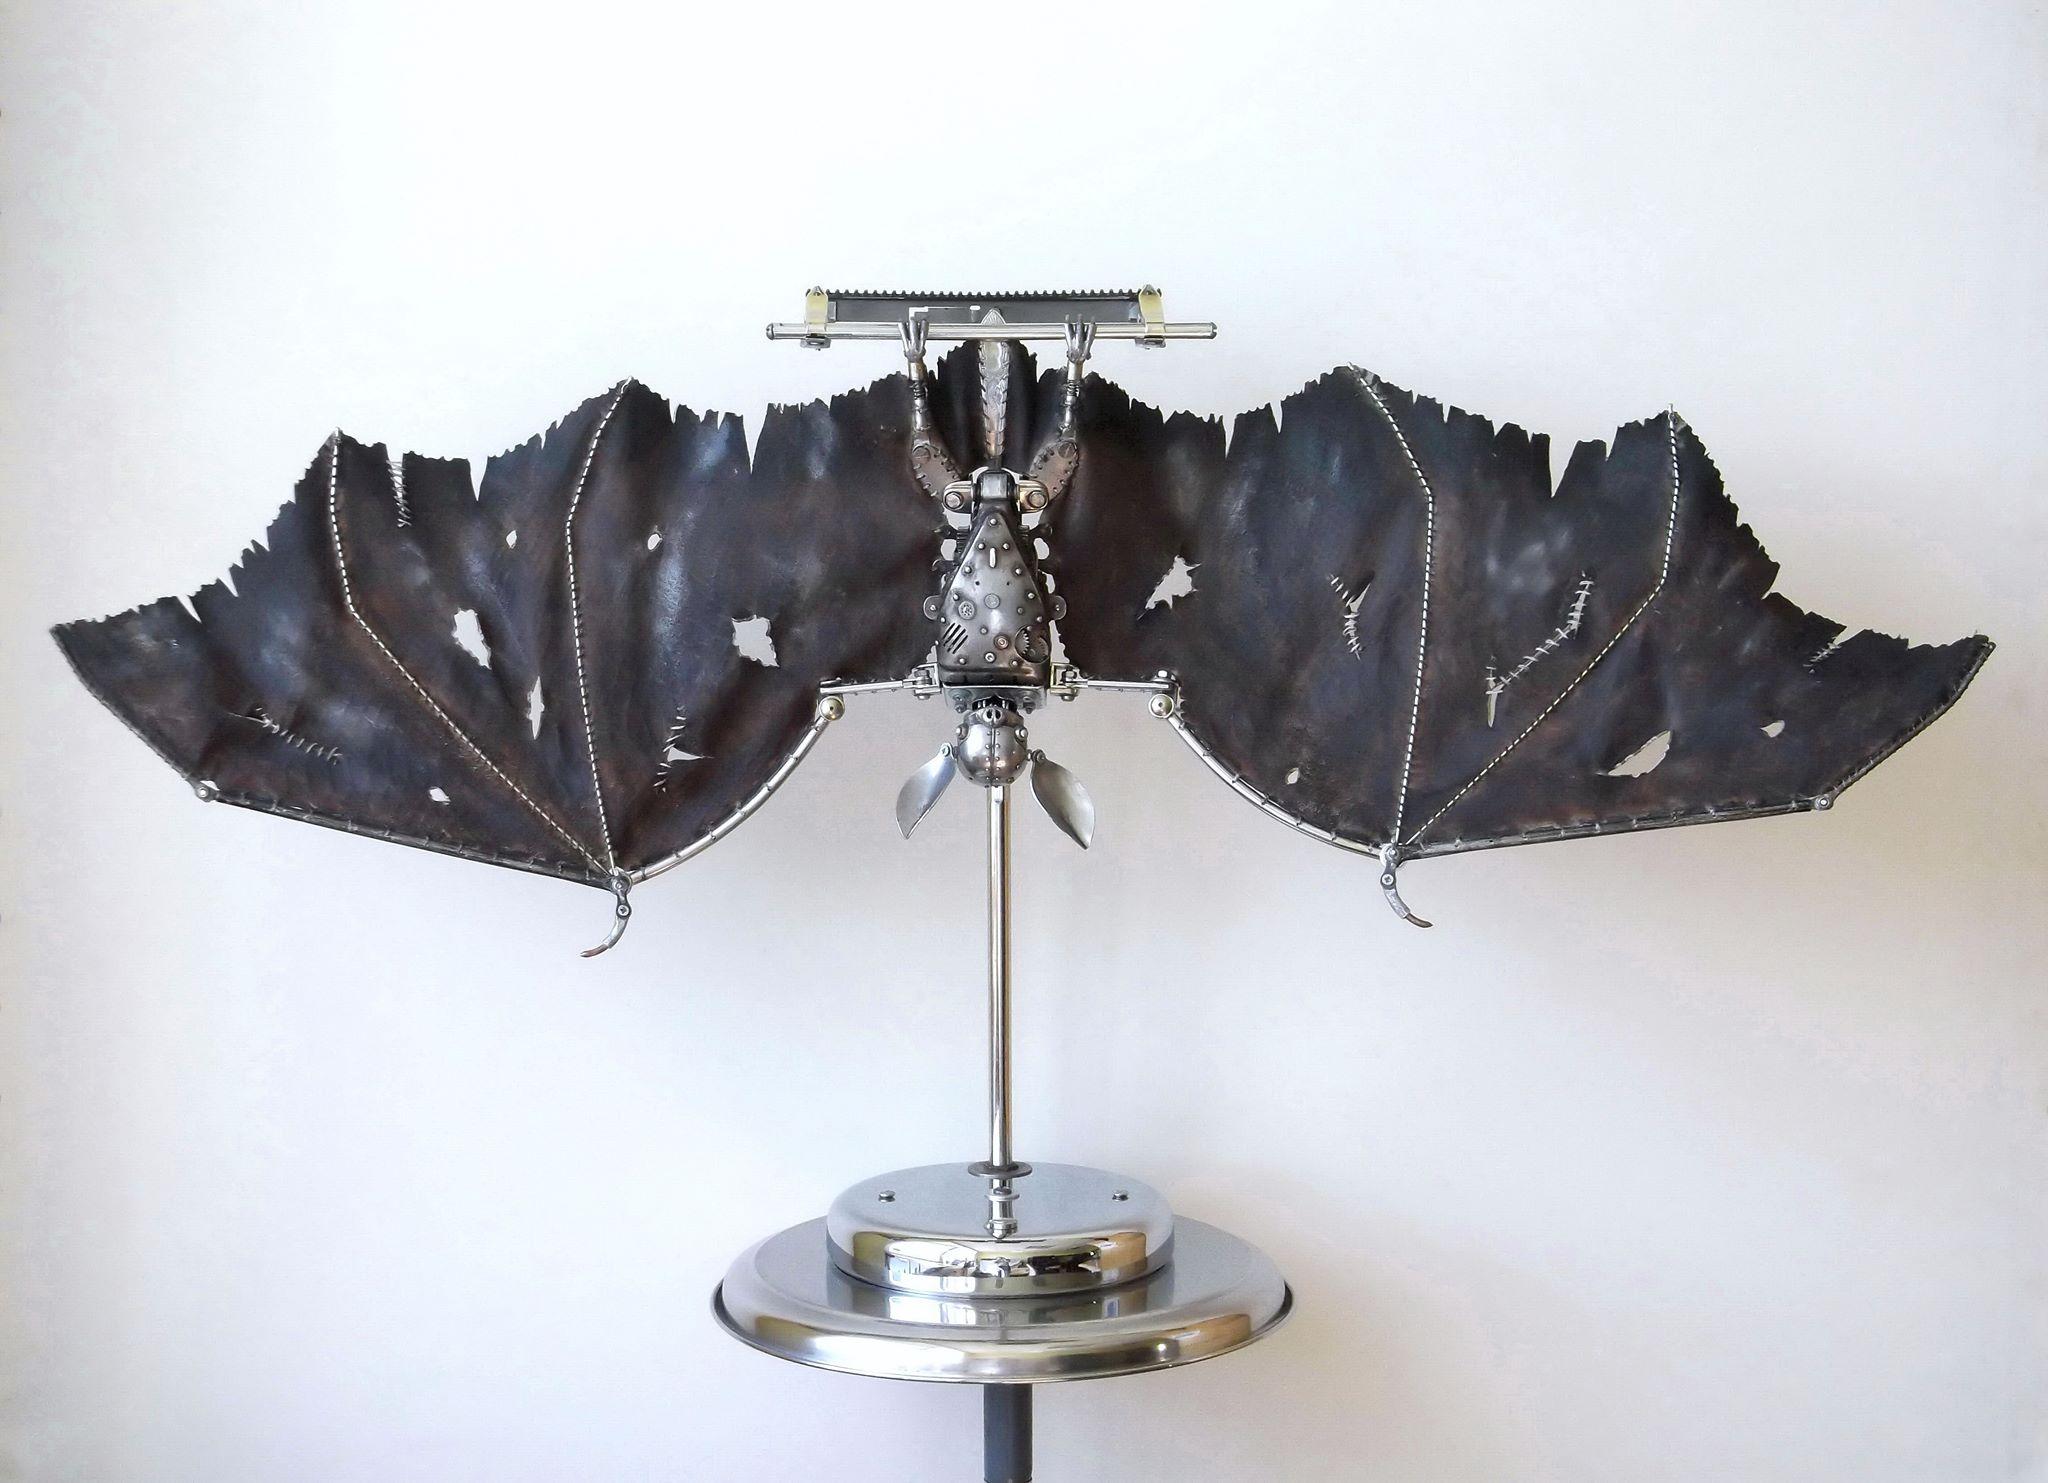 Steampunk sculptures – Igor Verniy – chauve souris